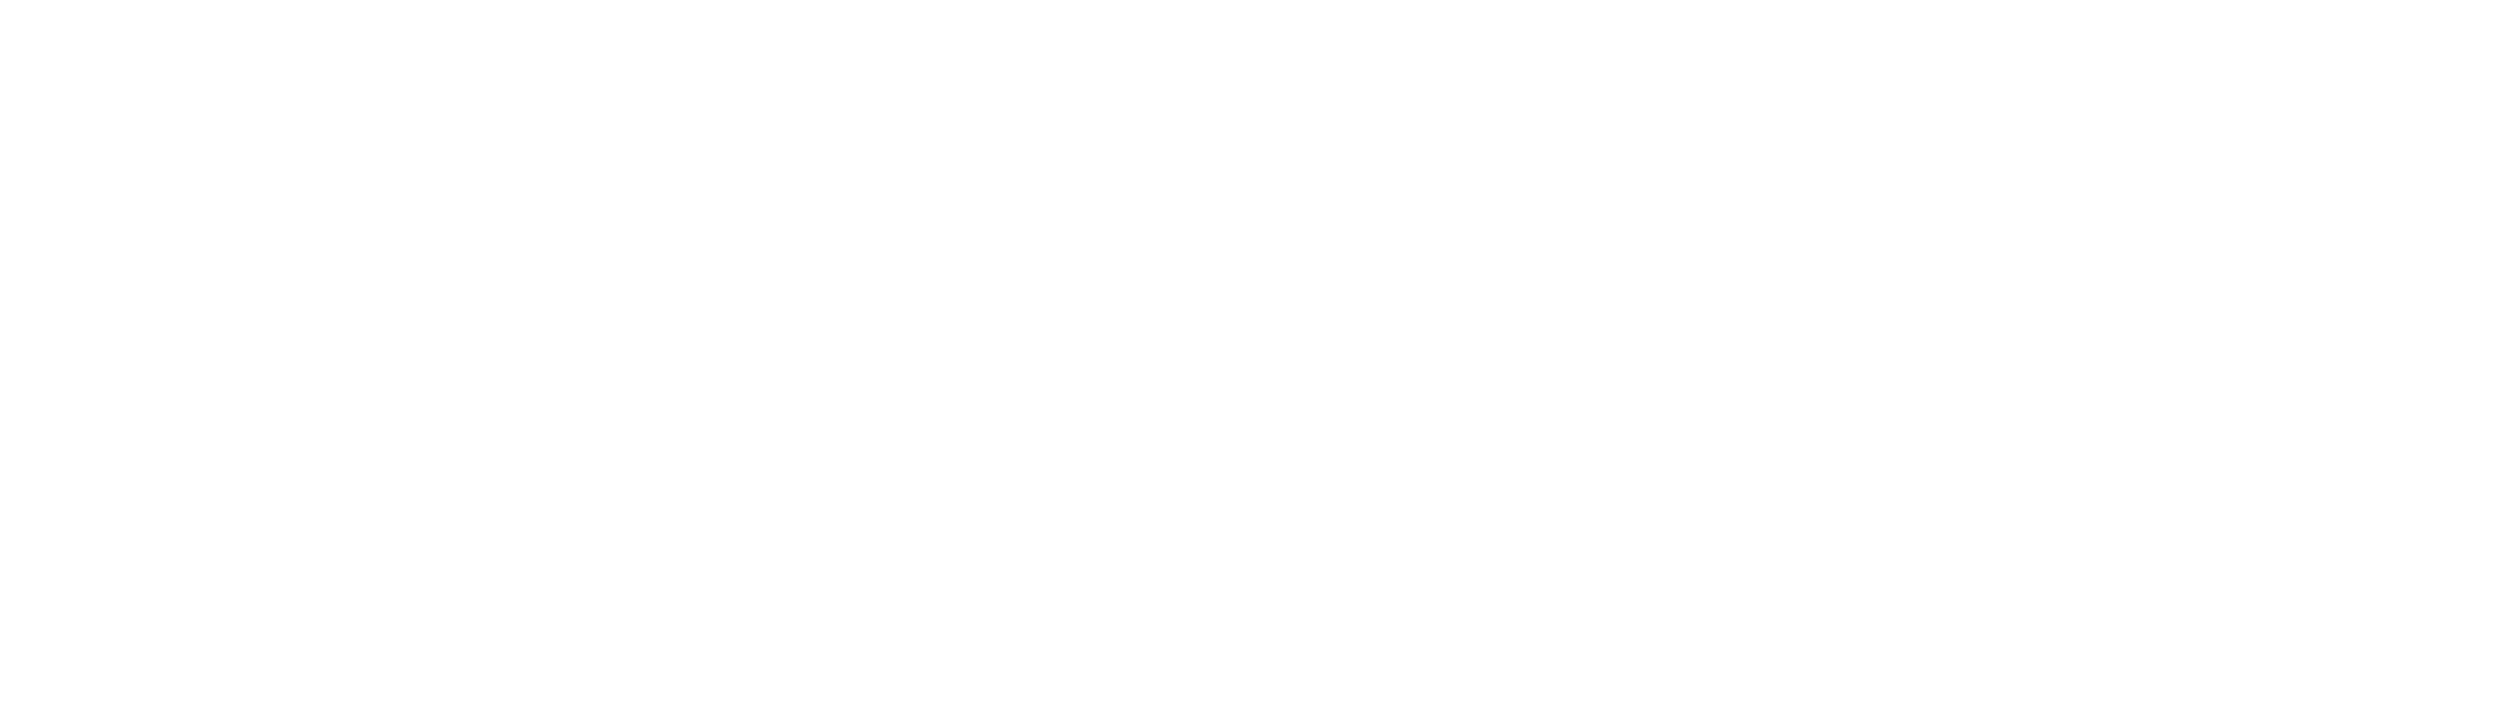 Joshua Watson Licensed Marriage & Family Therapist